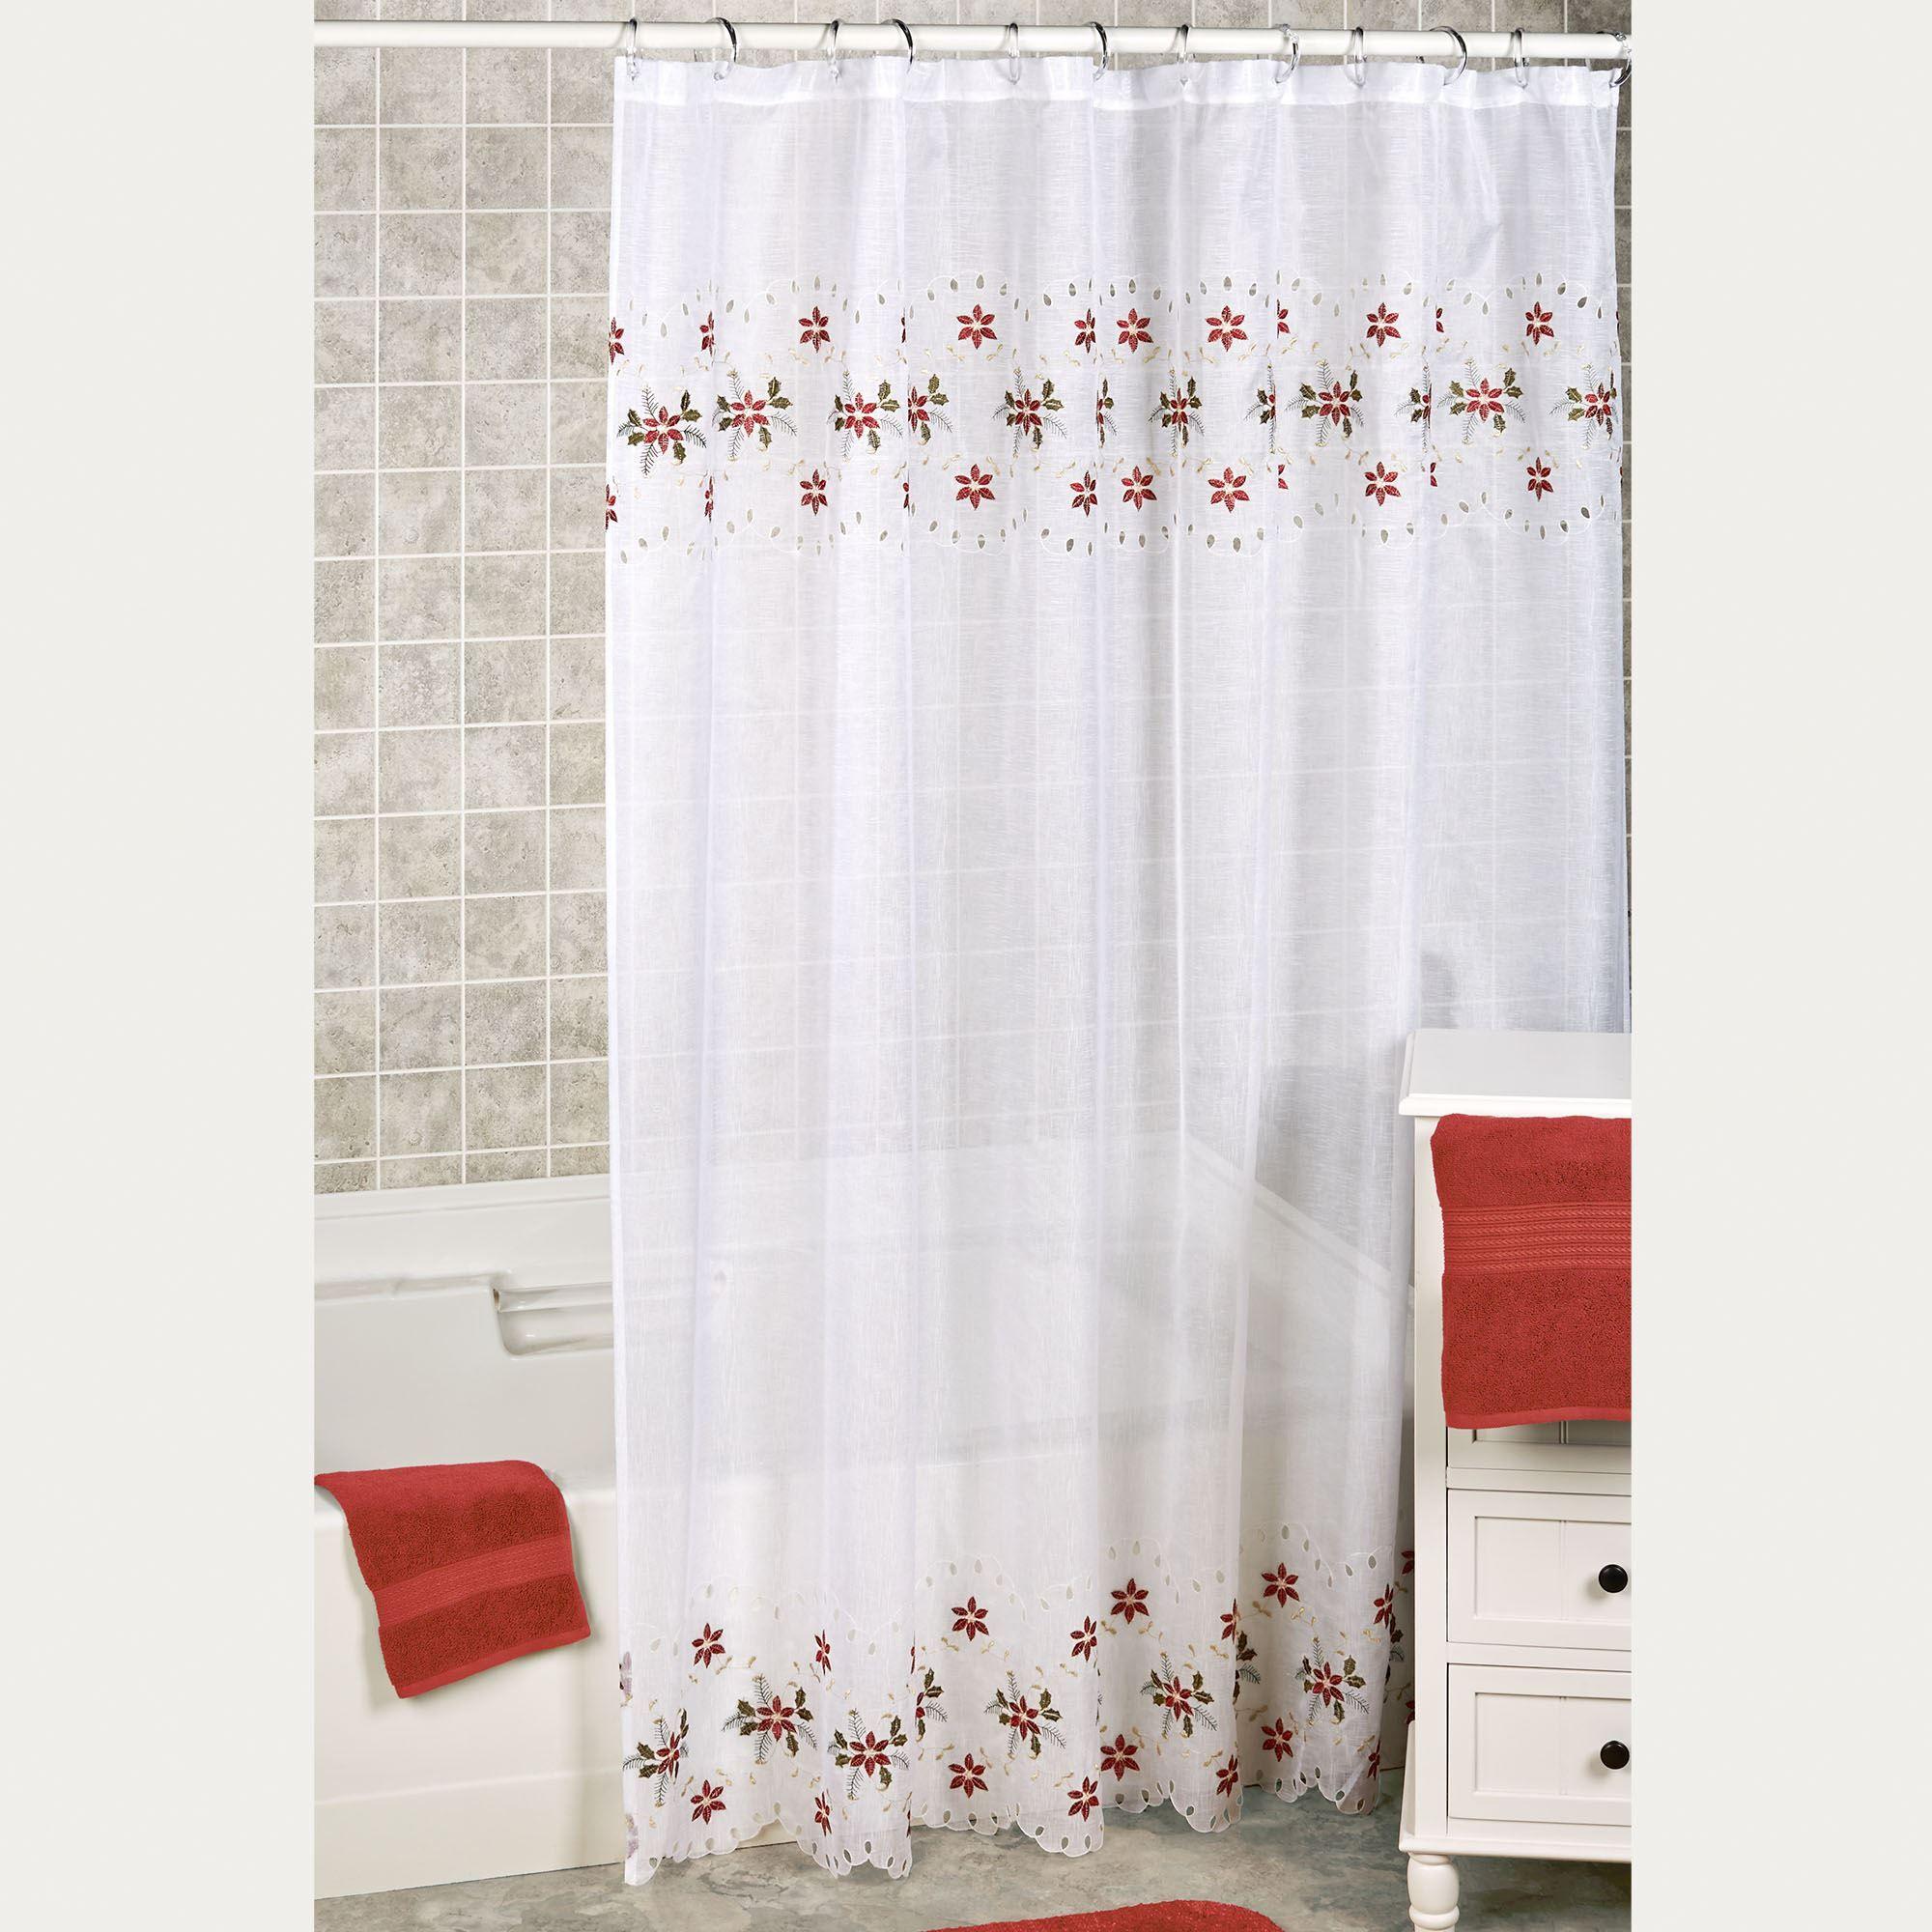 poinsettia semi sheer cutwork holiday shower curtain